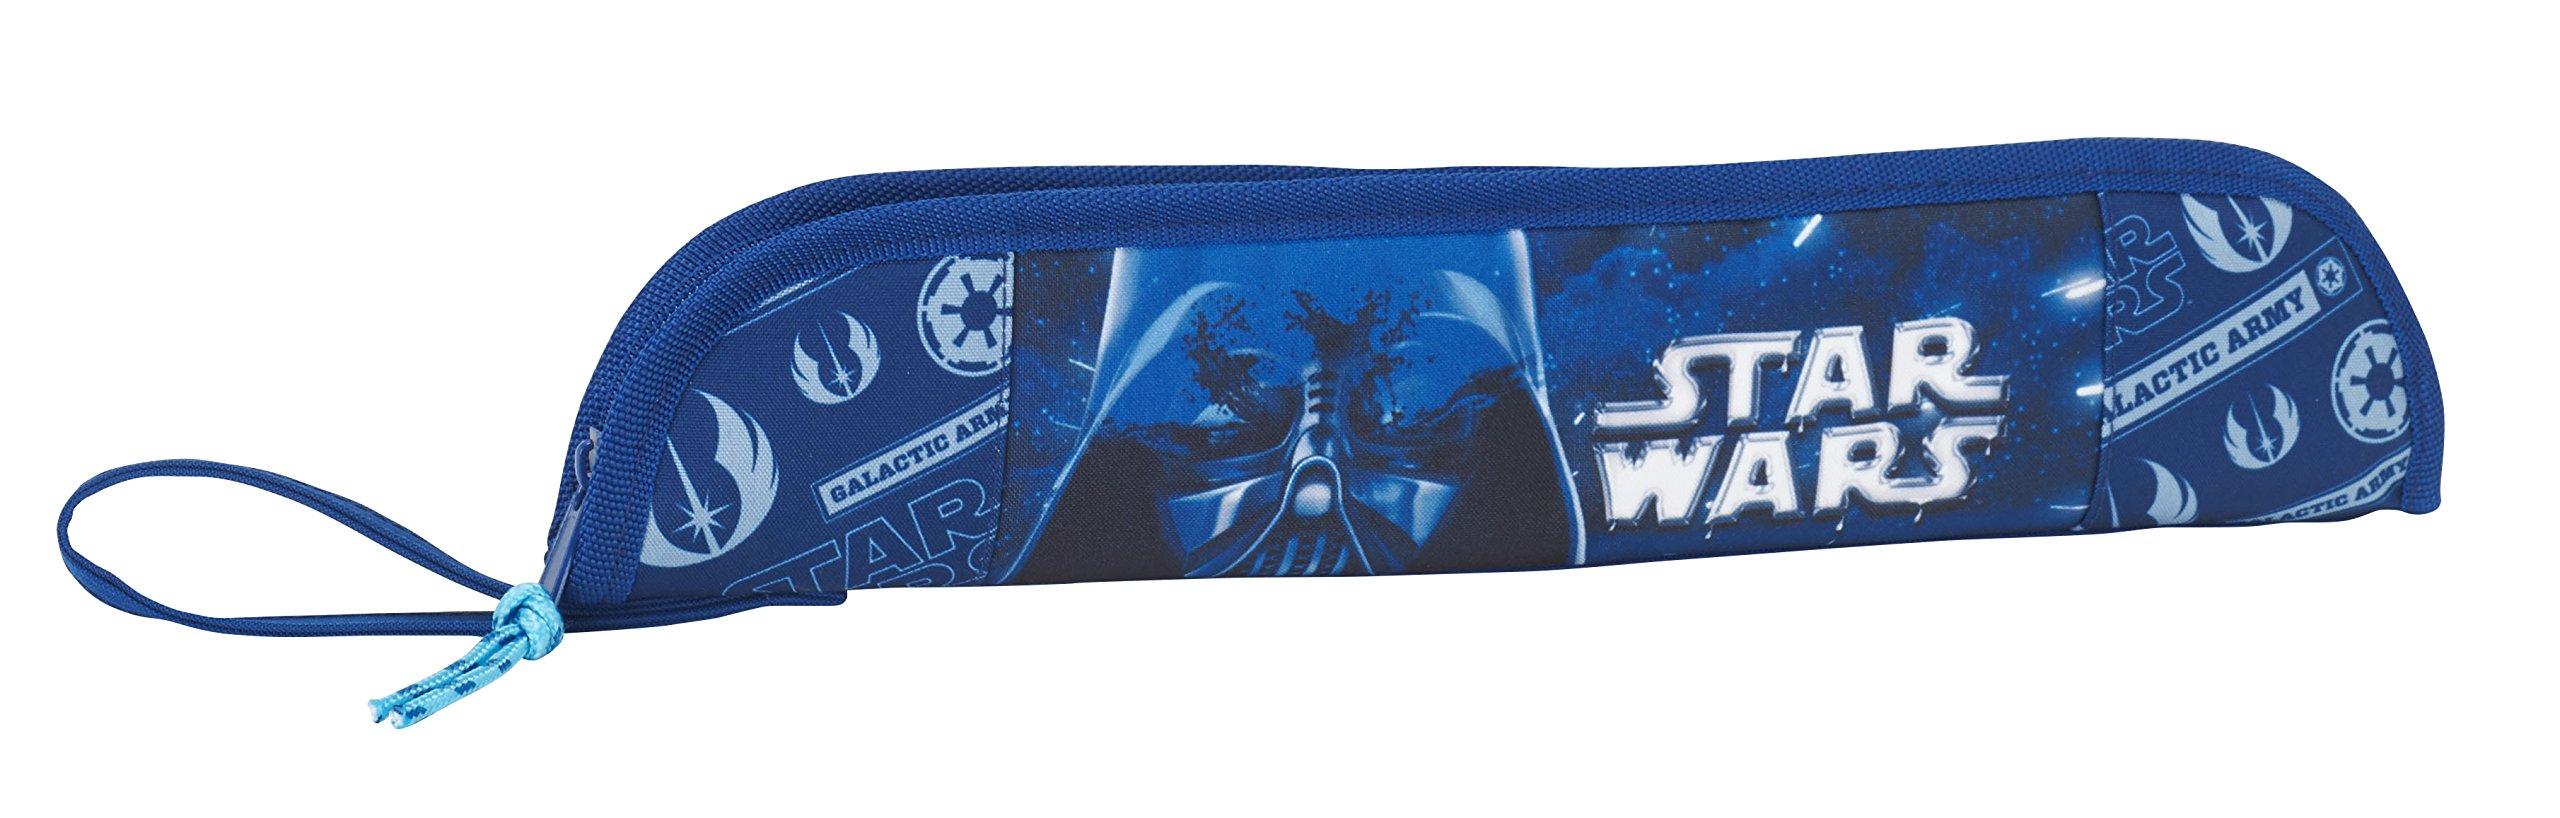 Safta Portaflautas Star Wars «Neon» Oficial Protector Flauta 370x20x80mm